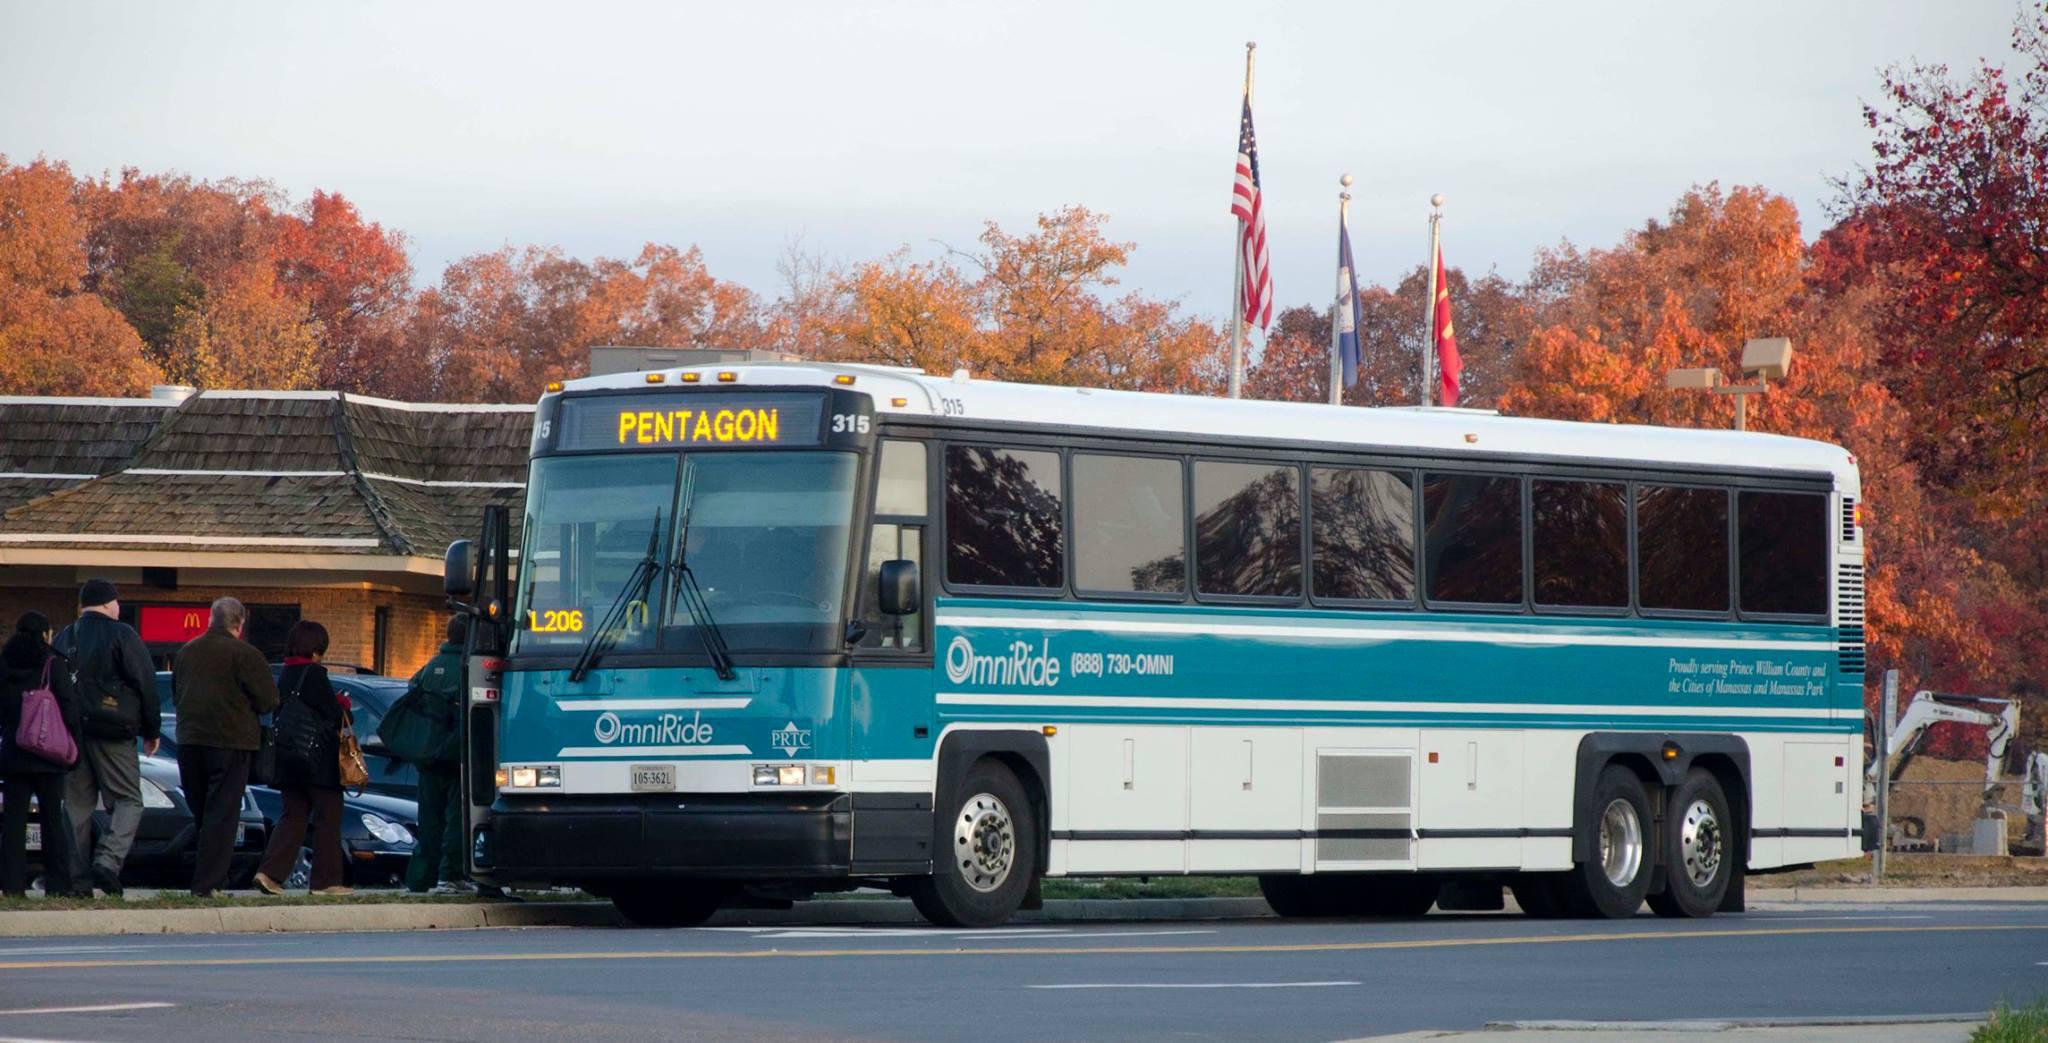 The Old PRTC Bus Design